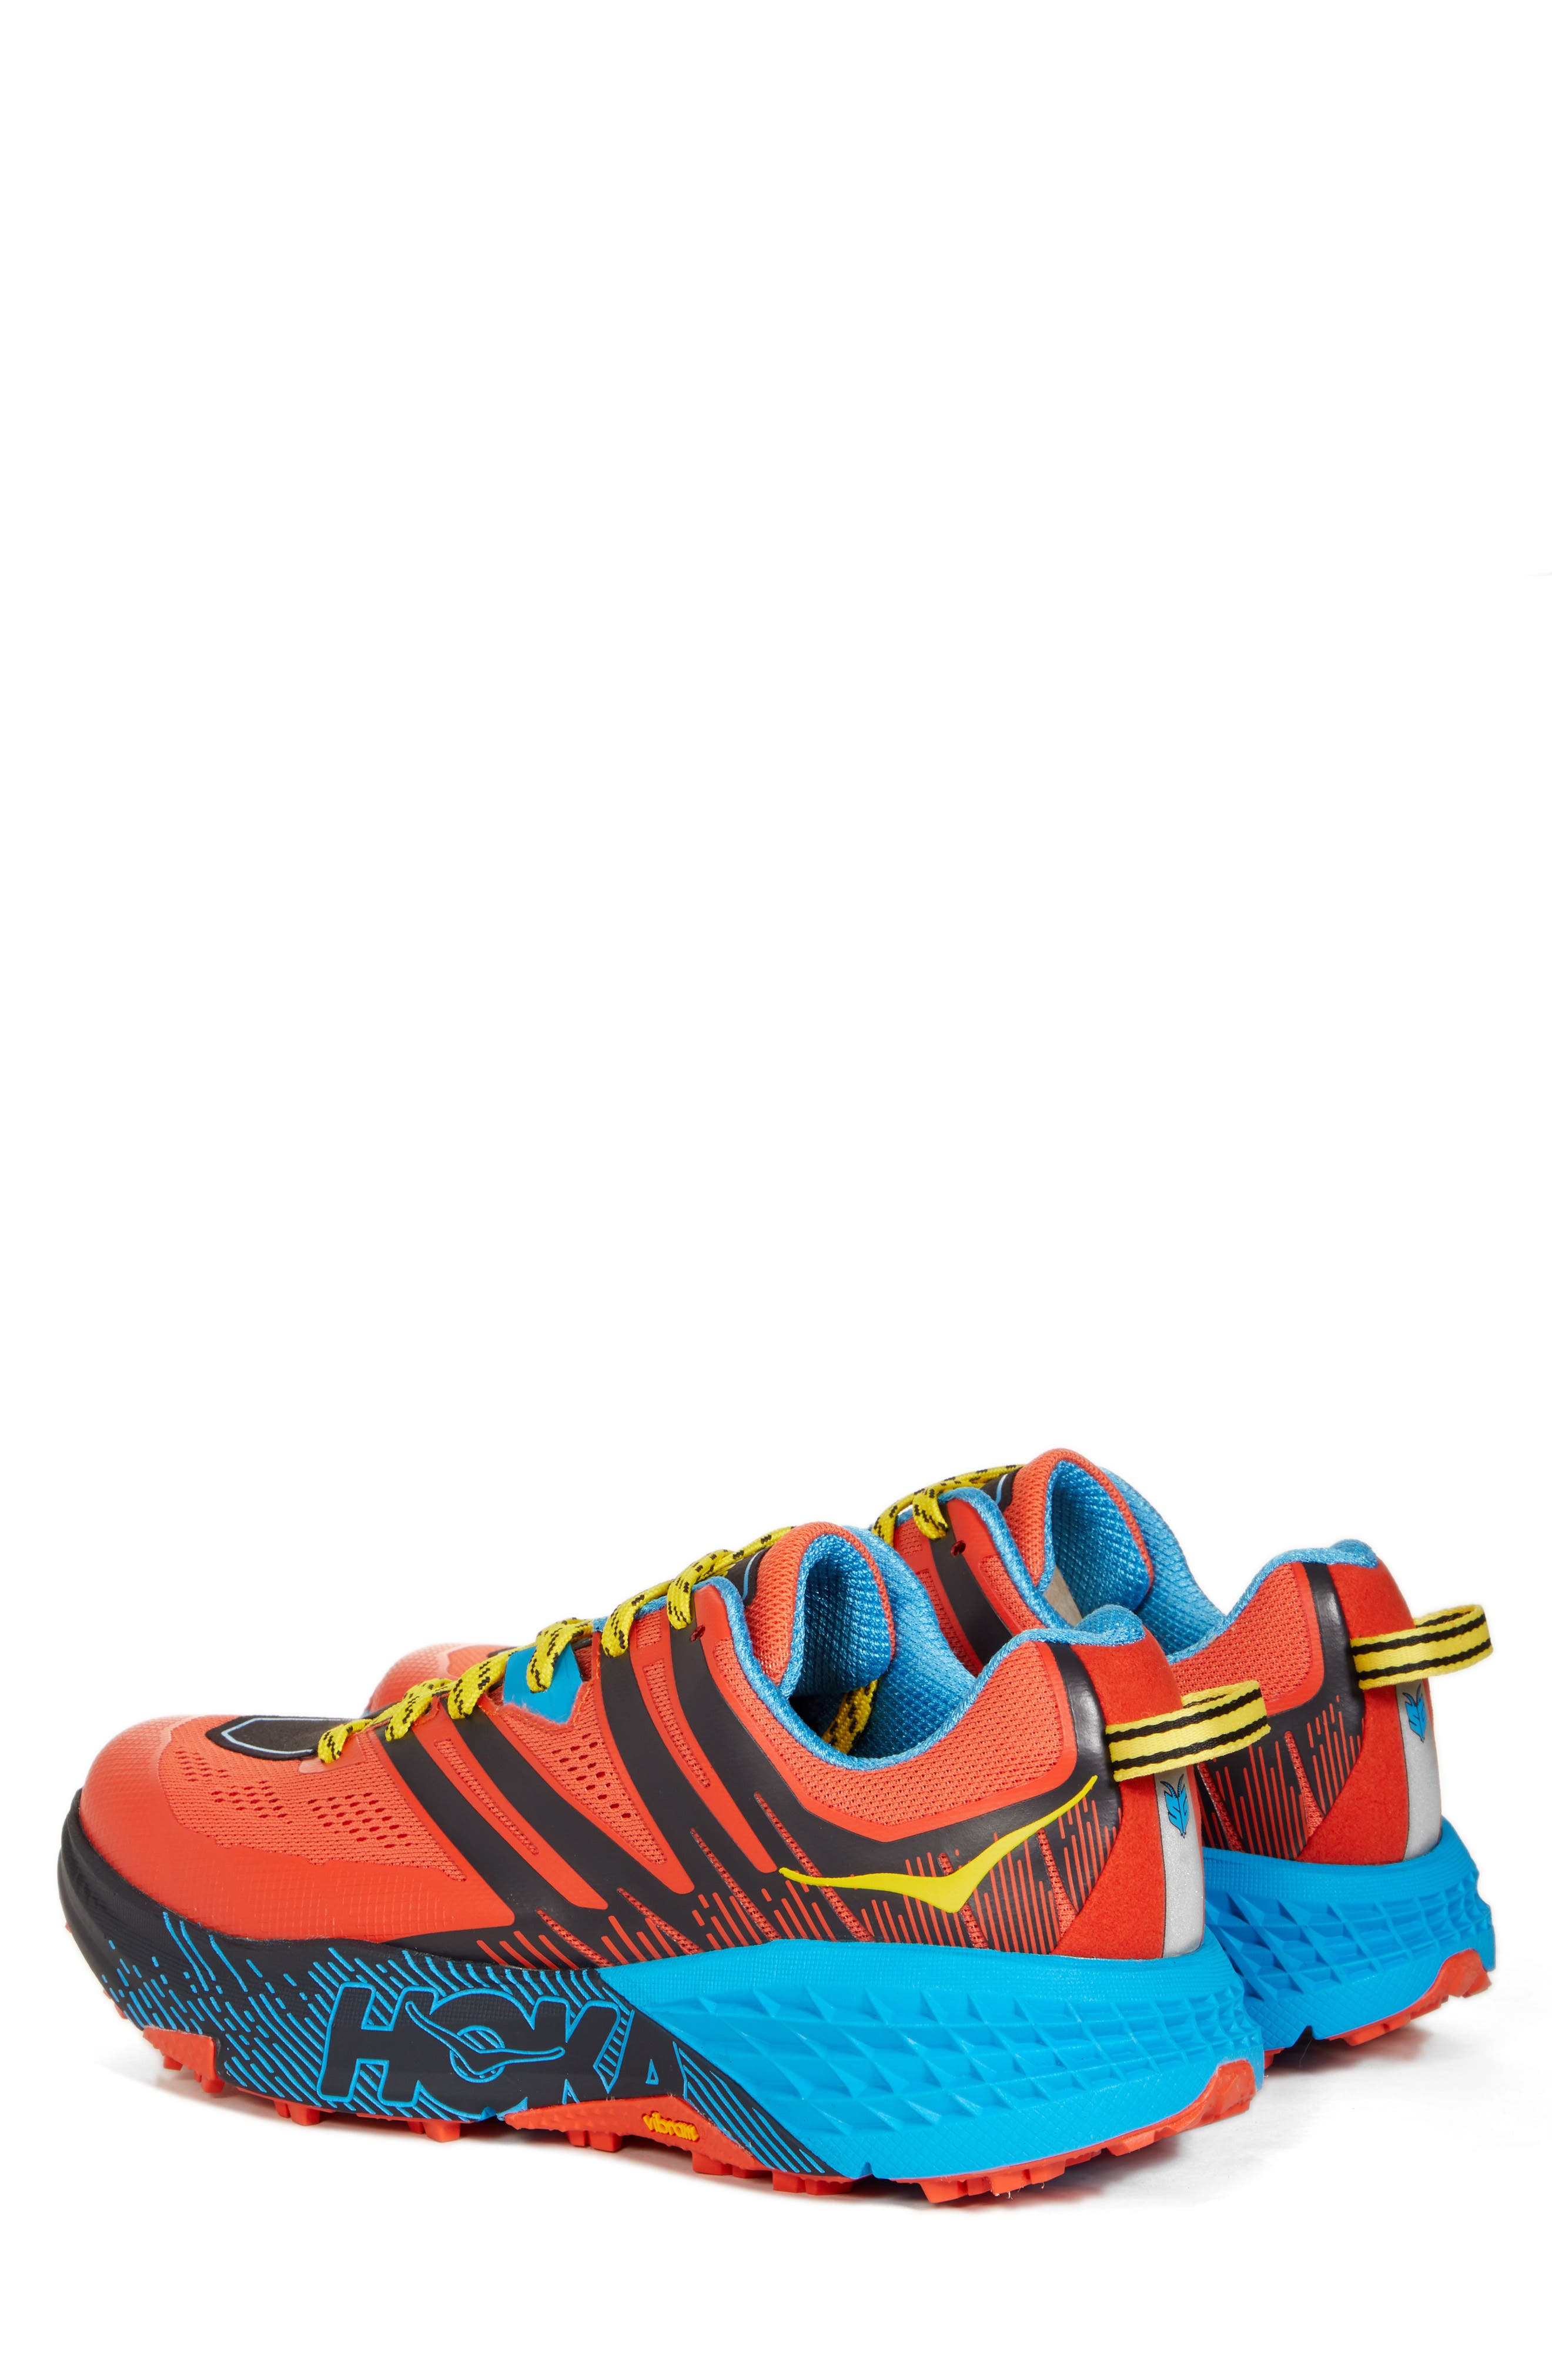 Speedgoat 3 Trail Running Shoe,                             Alternate thumbnail 3, color,                             NASTURTIUM/ SPICY ORANGE